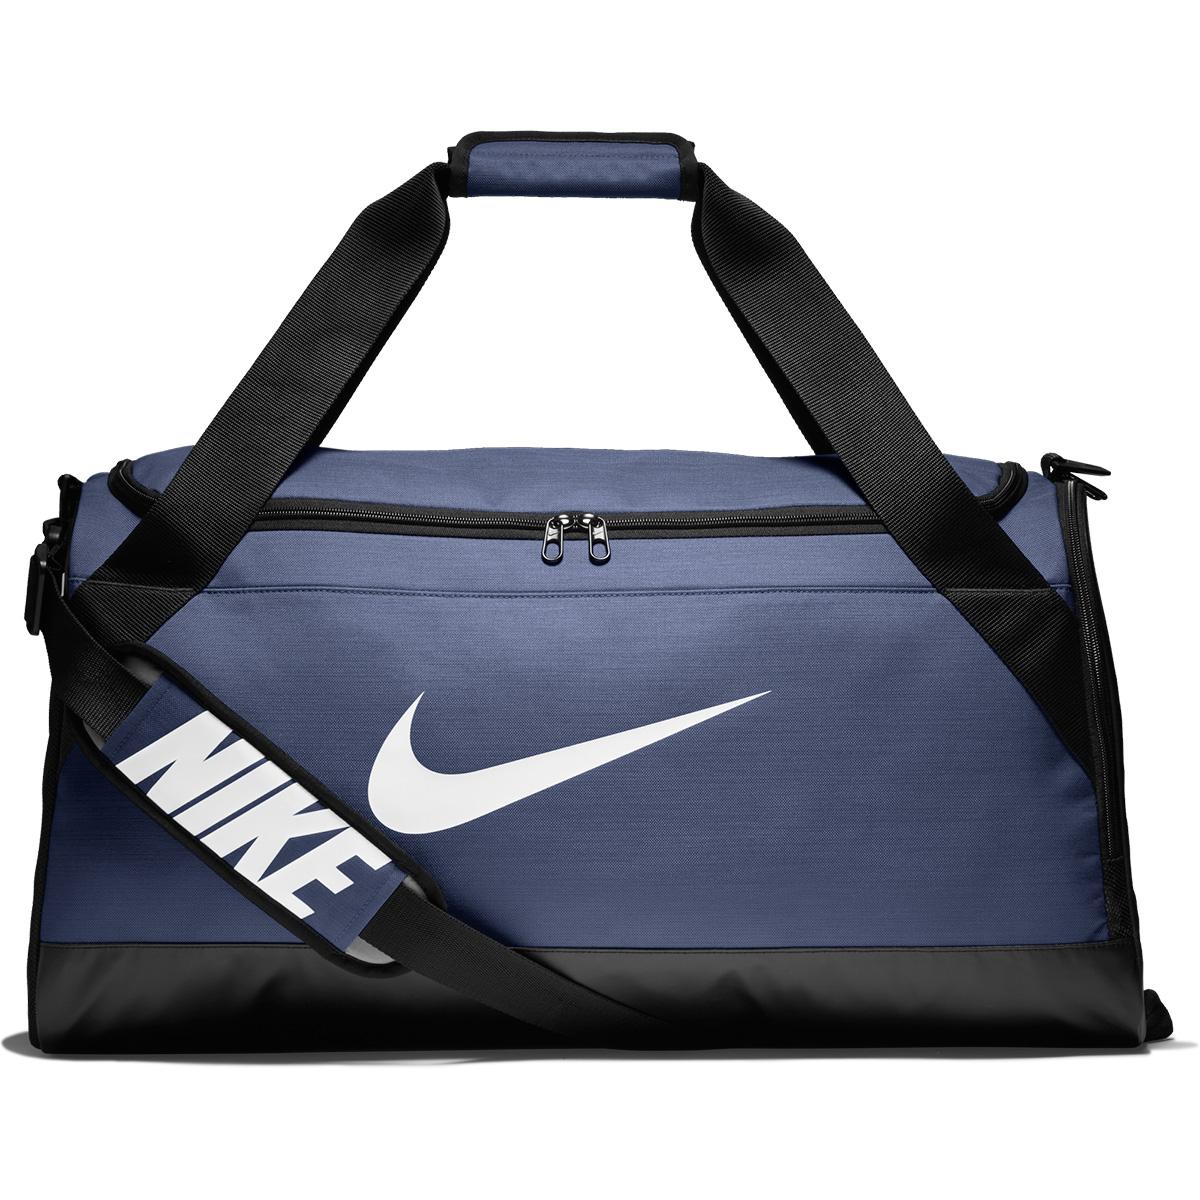 mala nike - Mala Nike Brasília Masculina - R$99,90